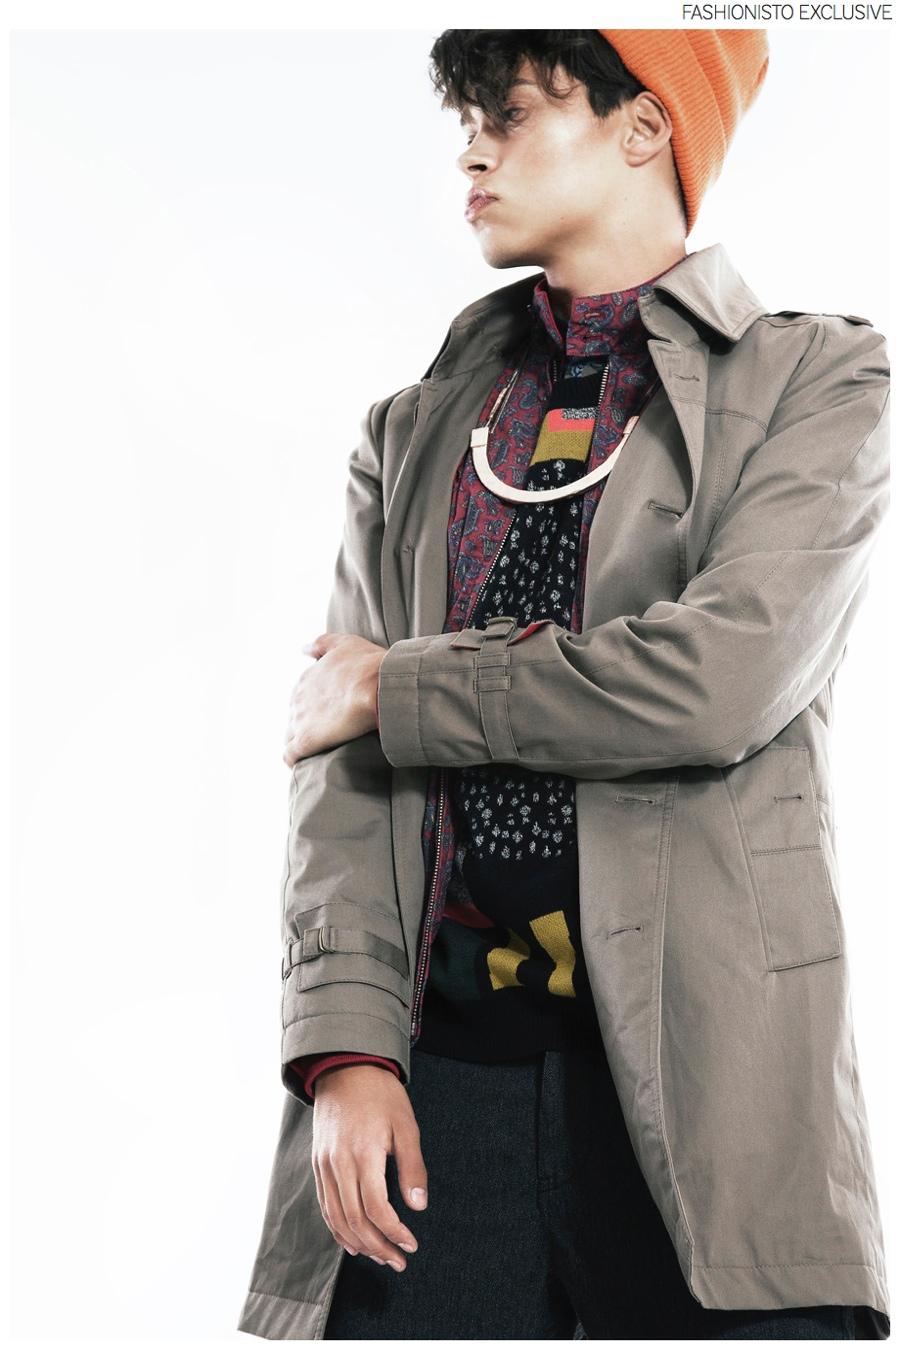 Tobias wears floral shirt NN.08, sweater Henrik Vibskov, red and blue jacket Ben Sherman, gray pants NN.08, trench Johnylove, necklace Bjorg and beanie Samsoe Samsoe.